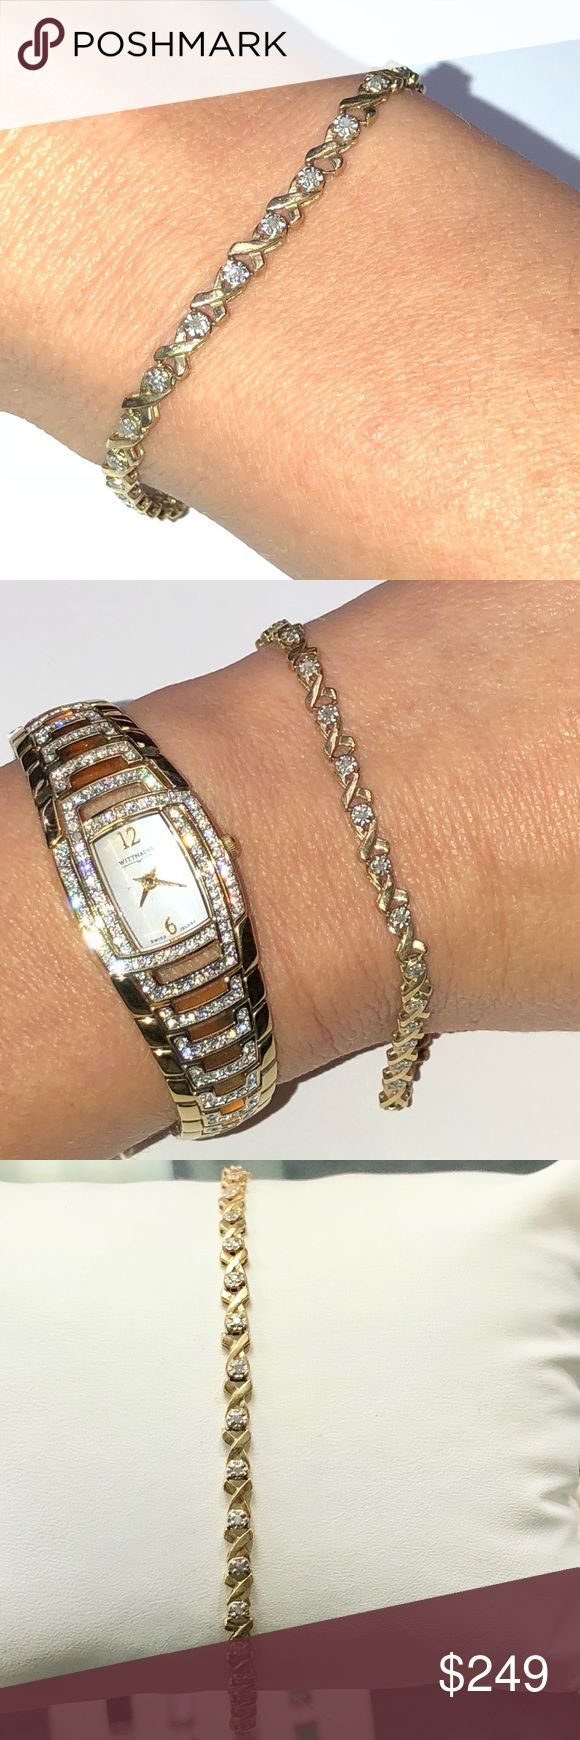 "10k Yellow Gold Diamond Tennis Bracelet 7.5"" 10k Yellow Gold Diamond Tennis Bracelet. The links close to the clasp have a stiffened solder area. Jewelry Bracelets #jewelrybracelets"